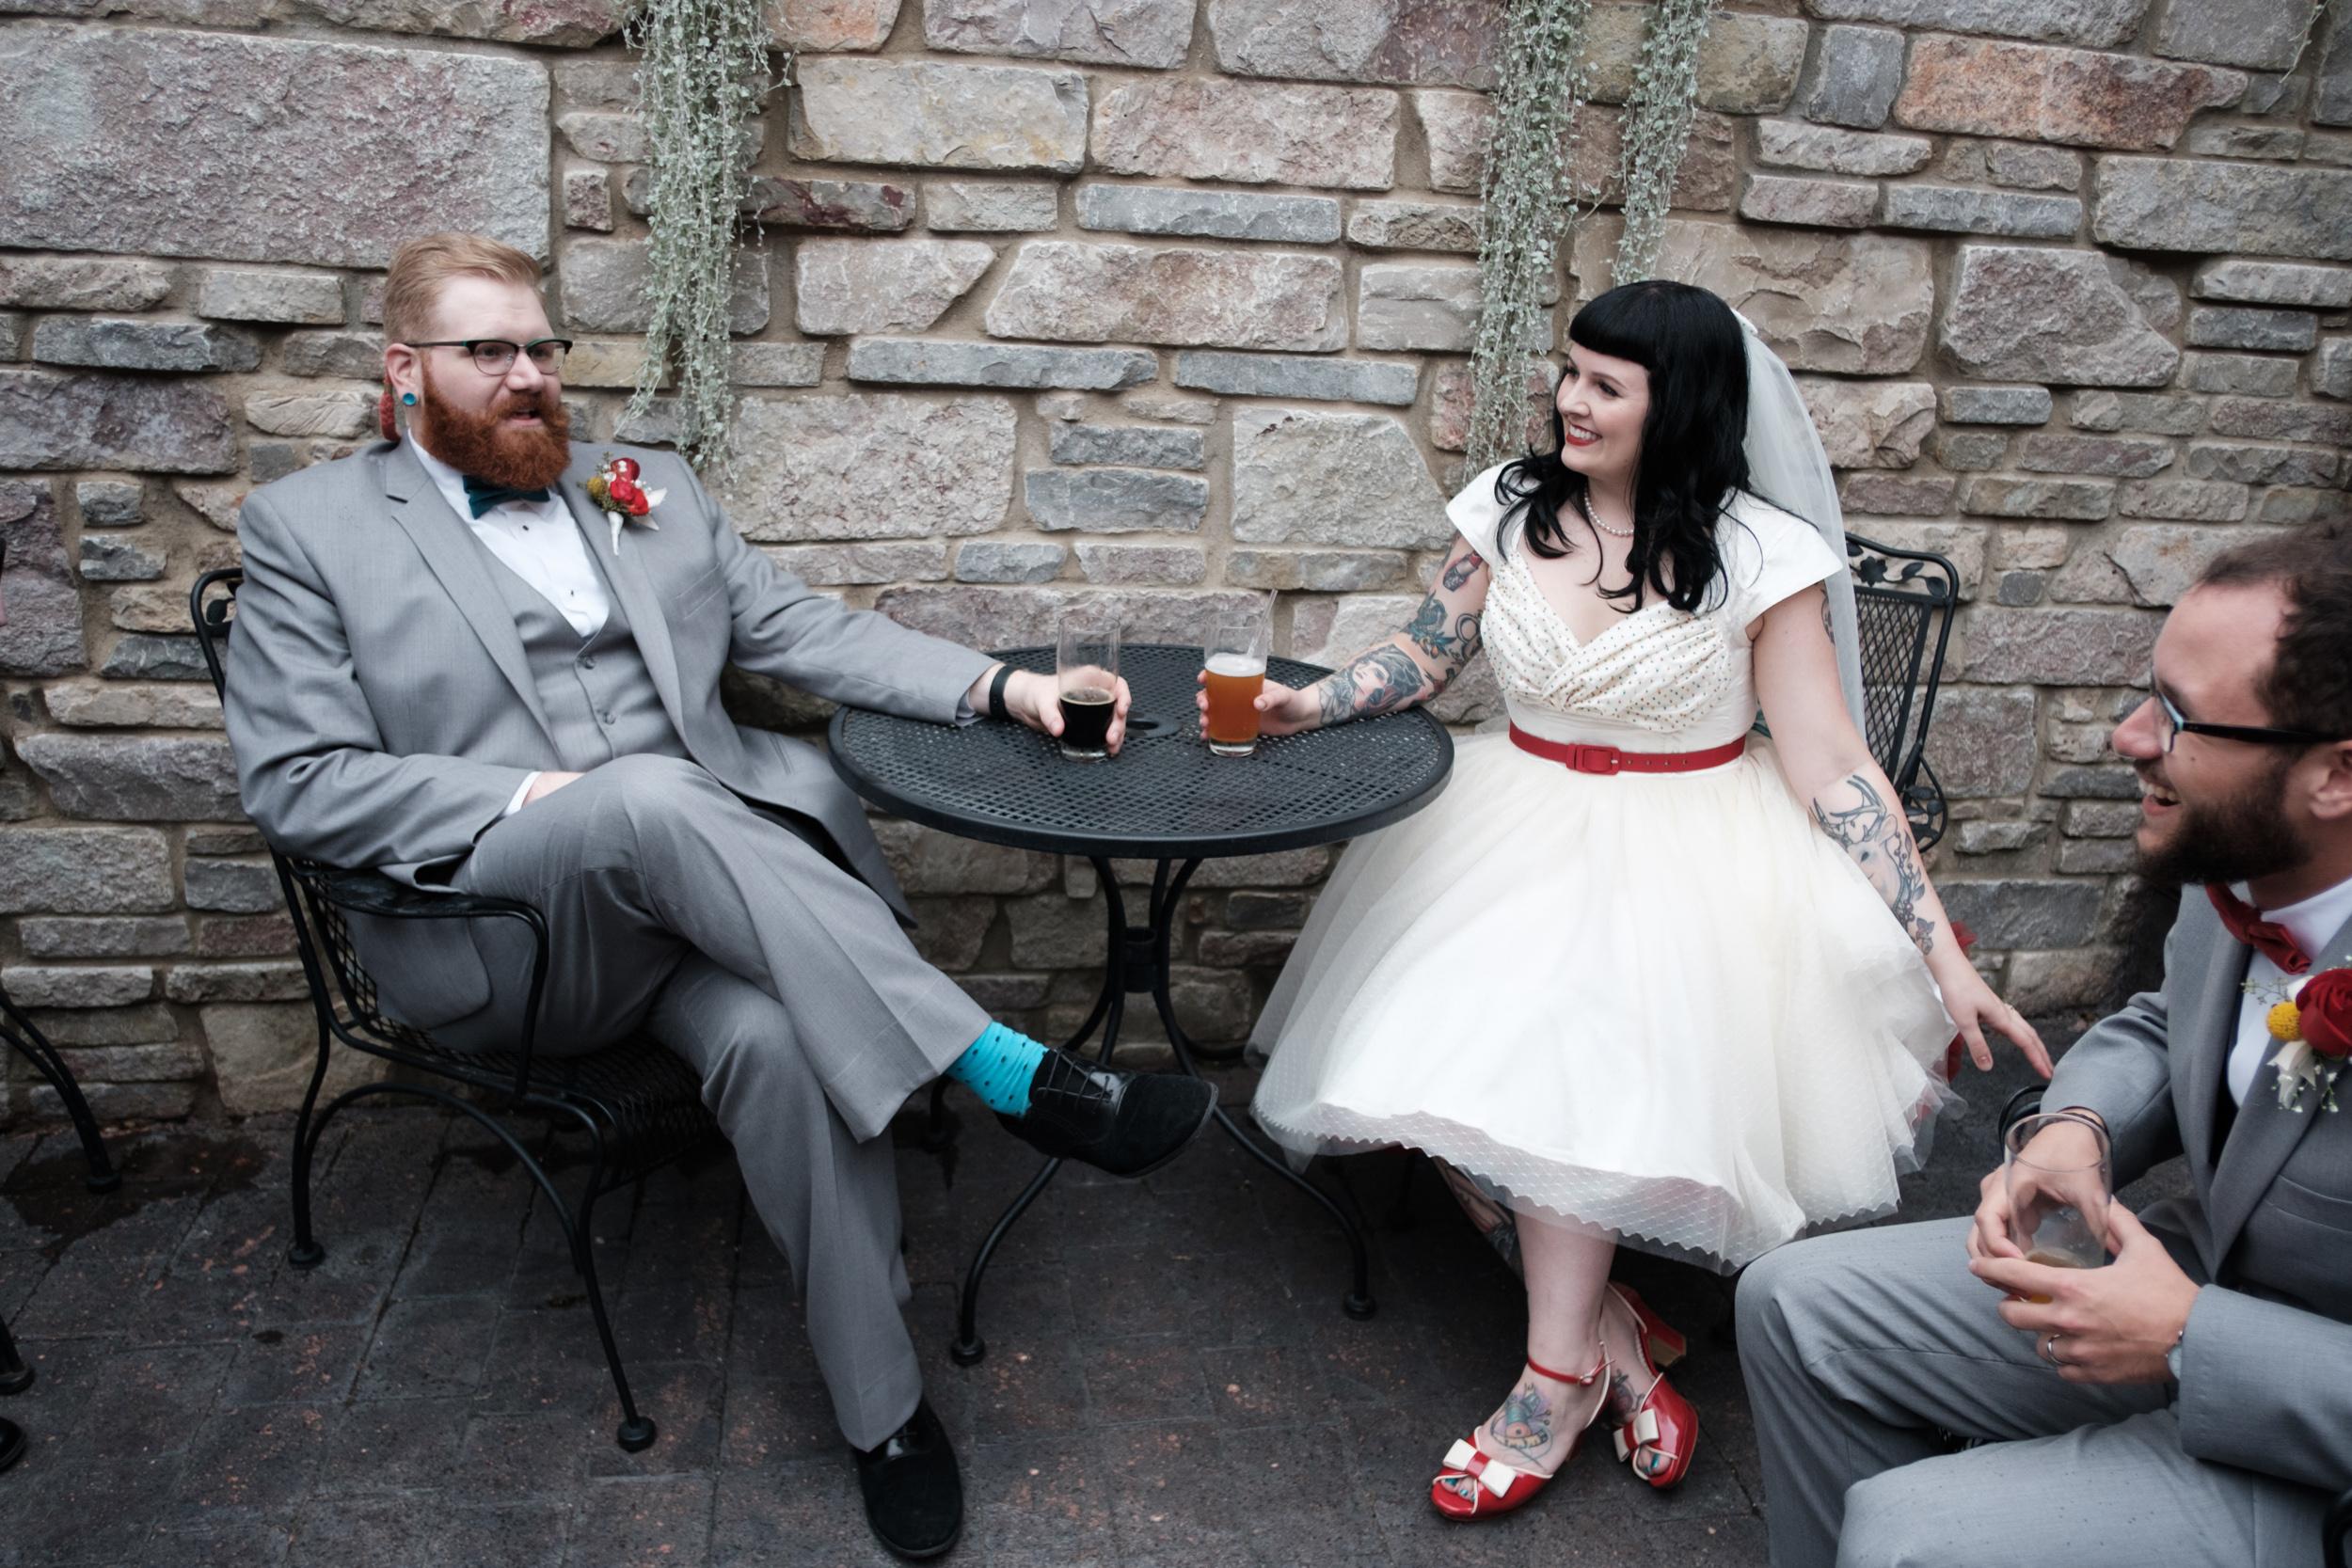 Christian & Sarah wedding photography by Brian milo-204.jpg